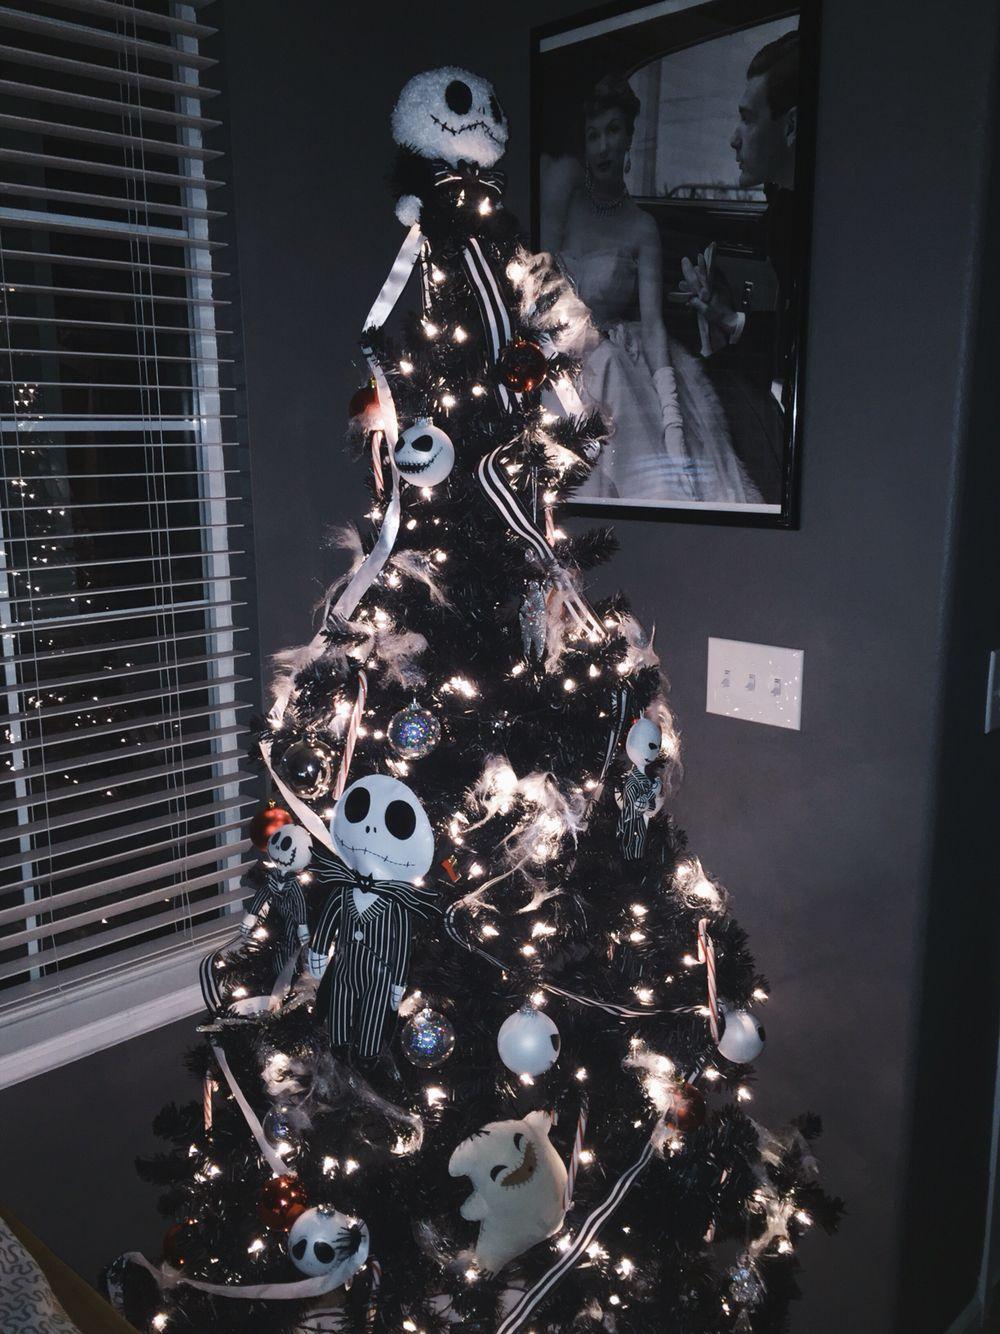 The Nightmare Before Christmas themed Christmas tree ...